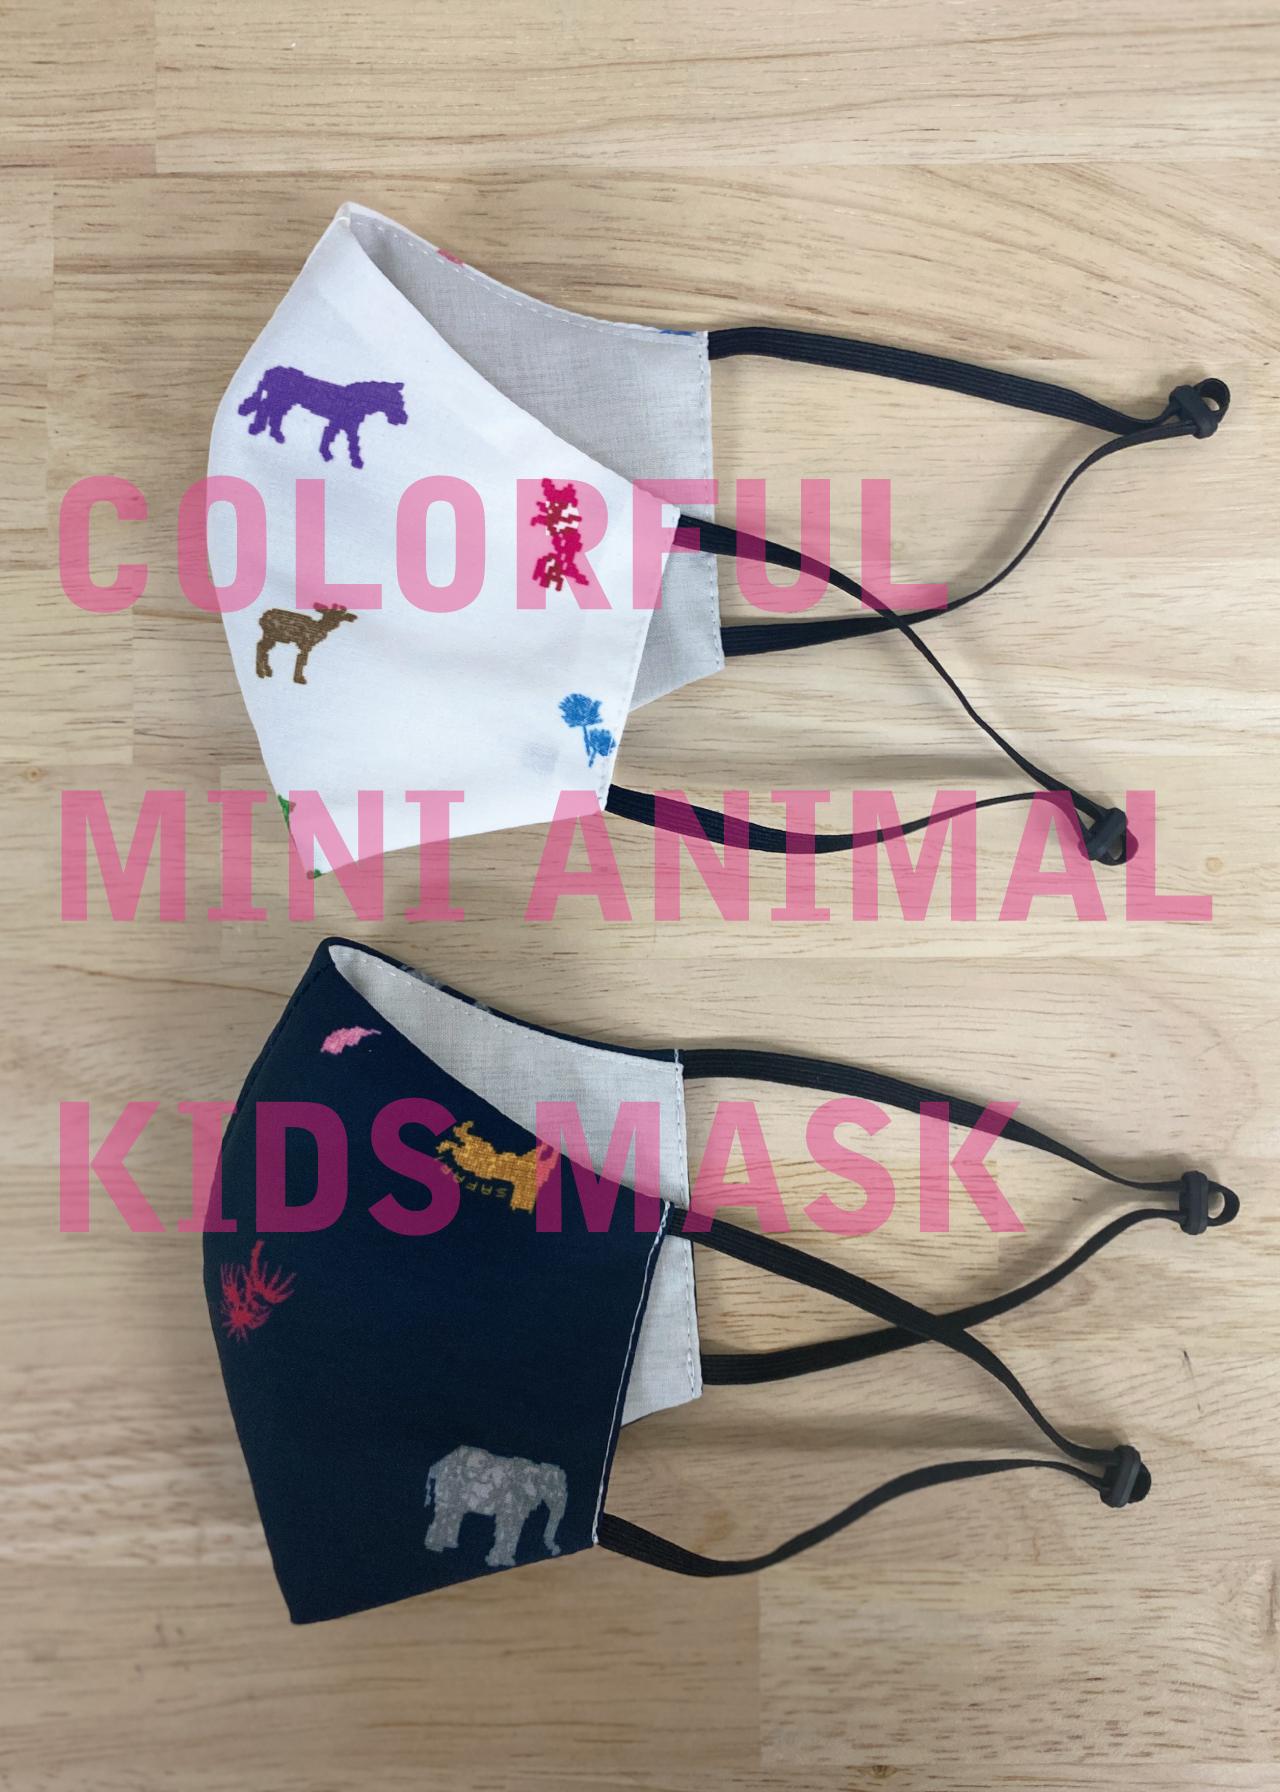 COLORFUL MINI-ANIMAL MASK (キッズ用)